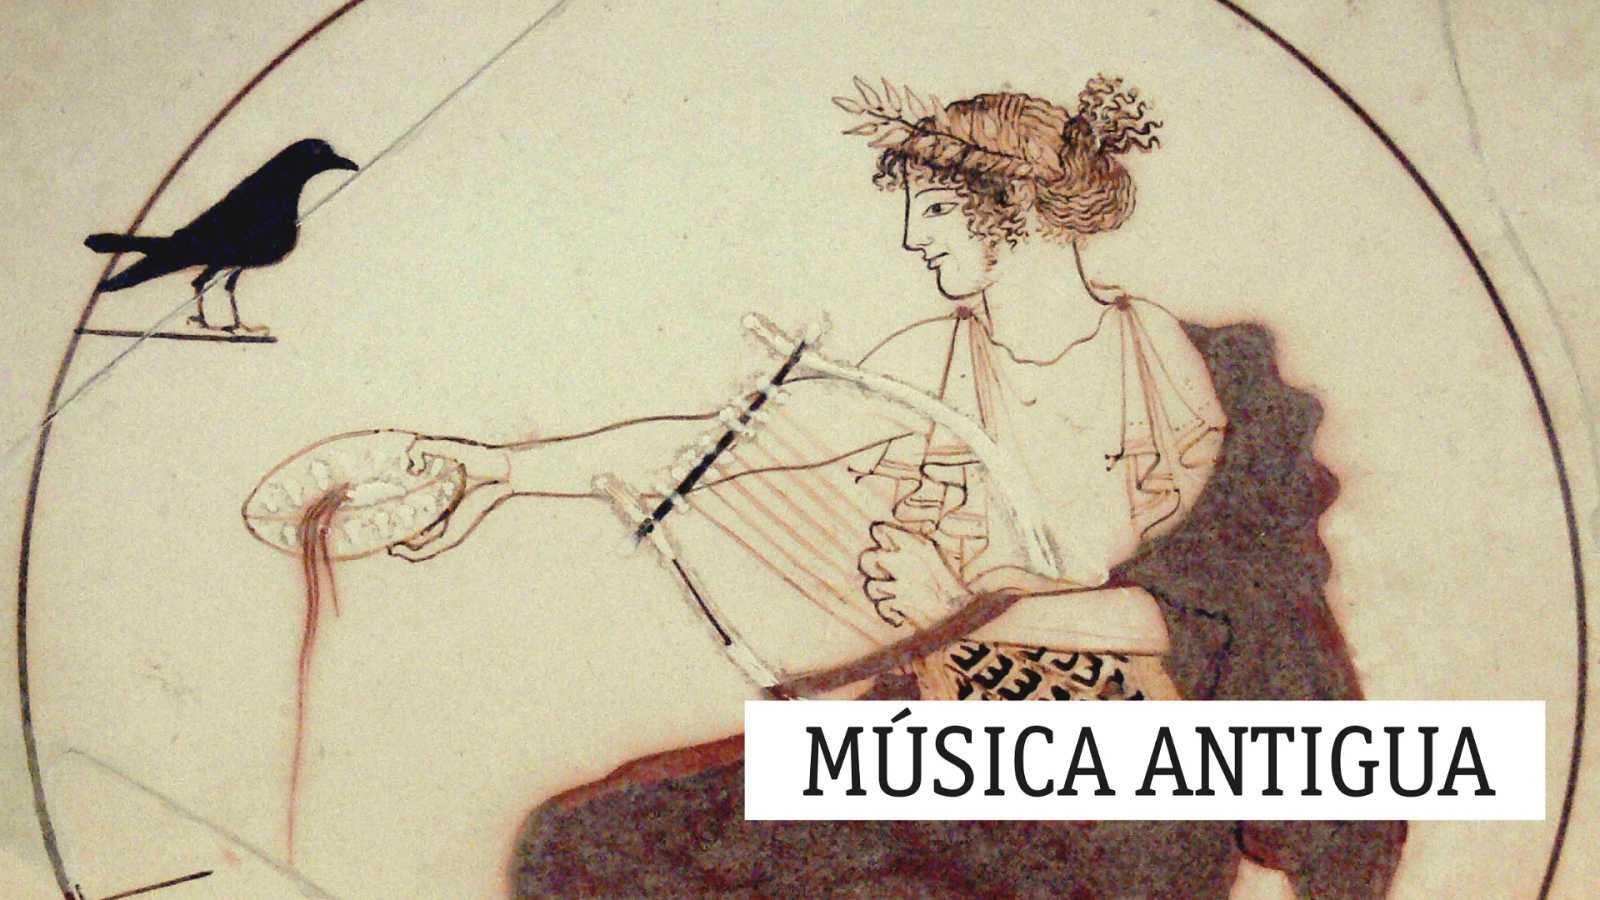 Música antigua - Savonarola - 19/01/21 - escuchar ahora